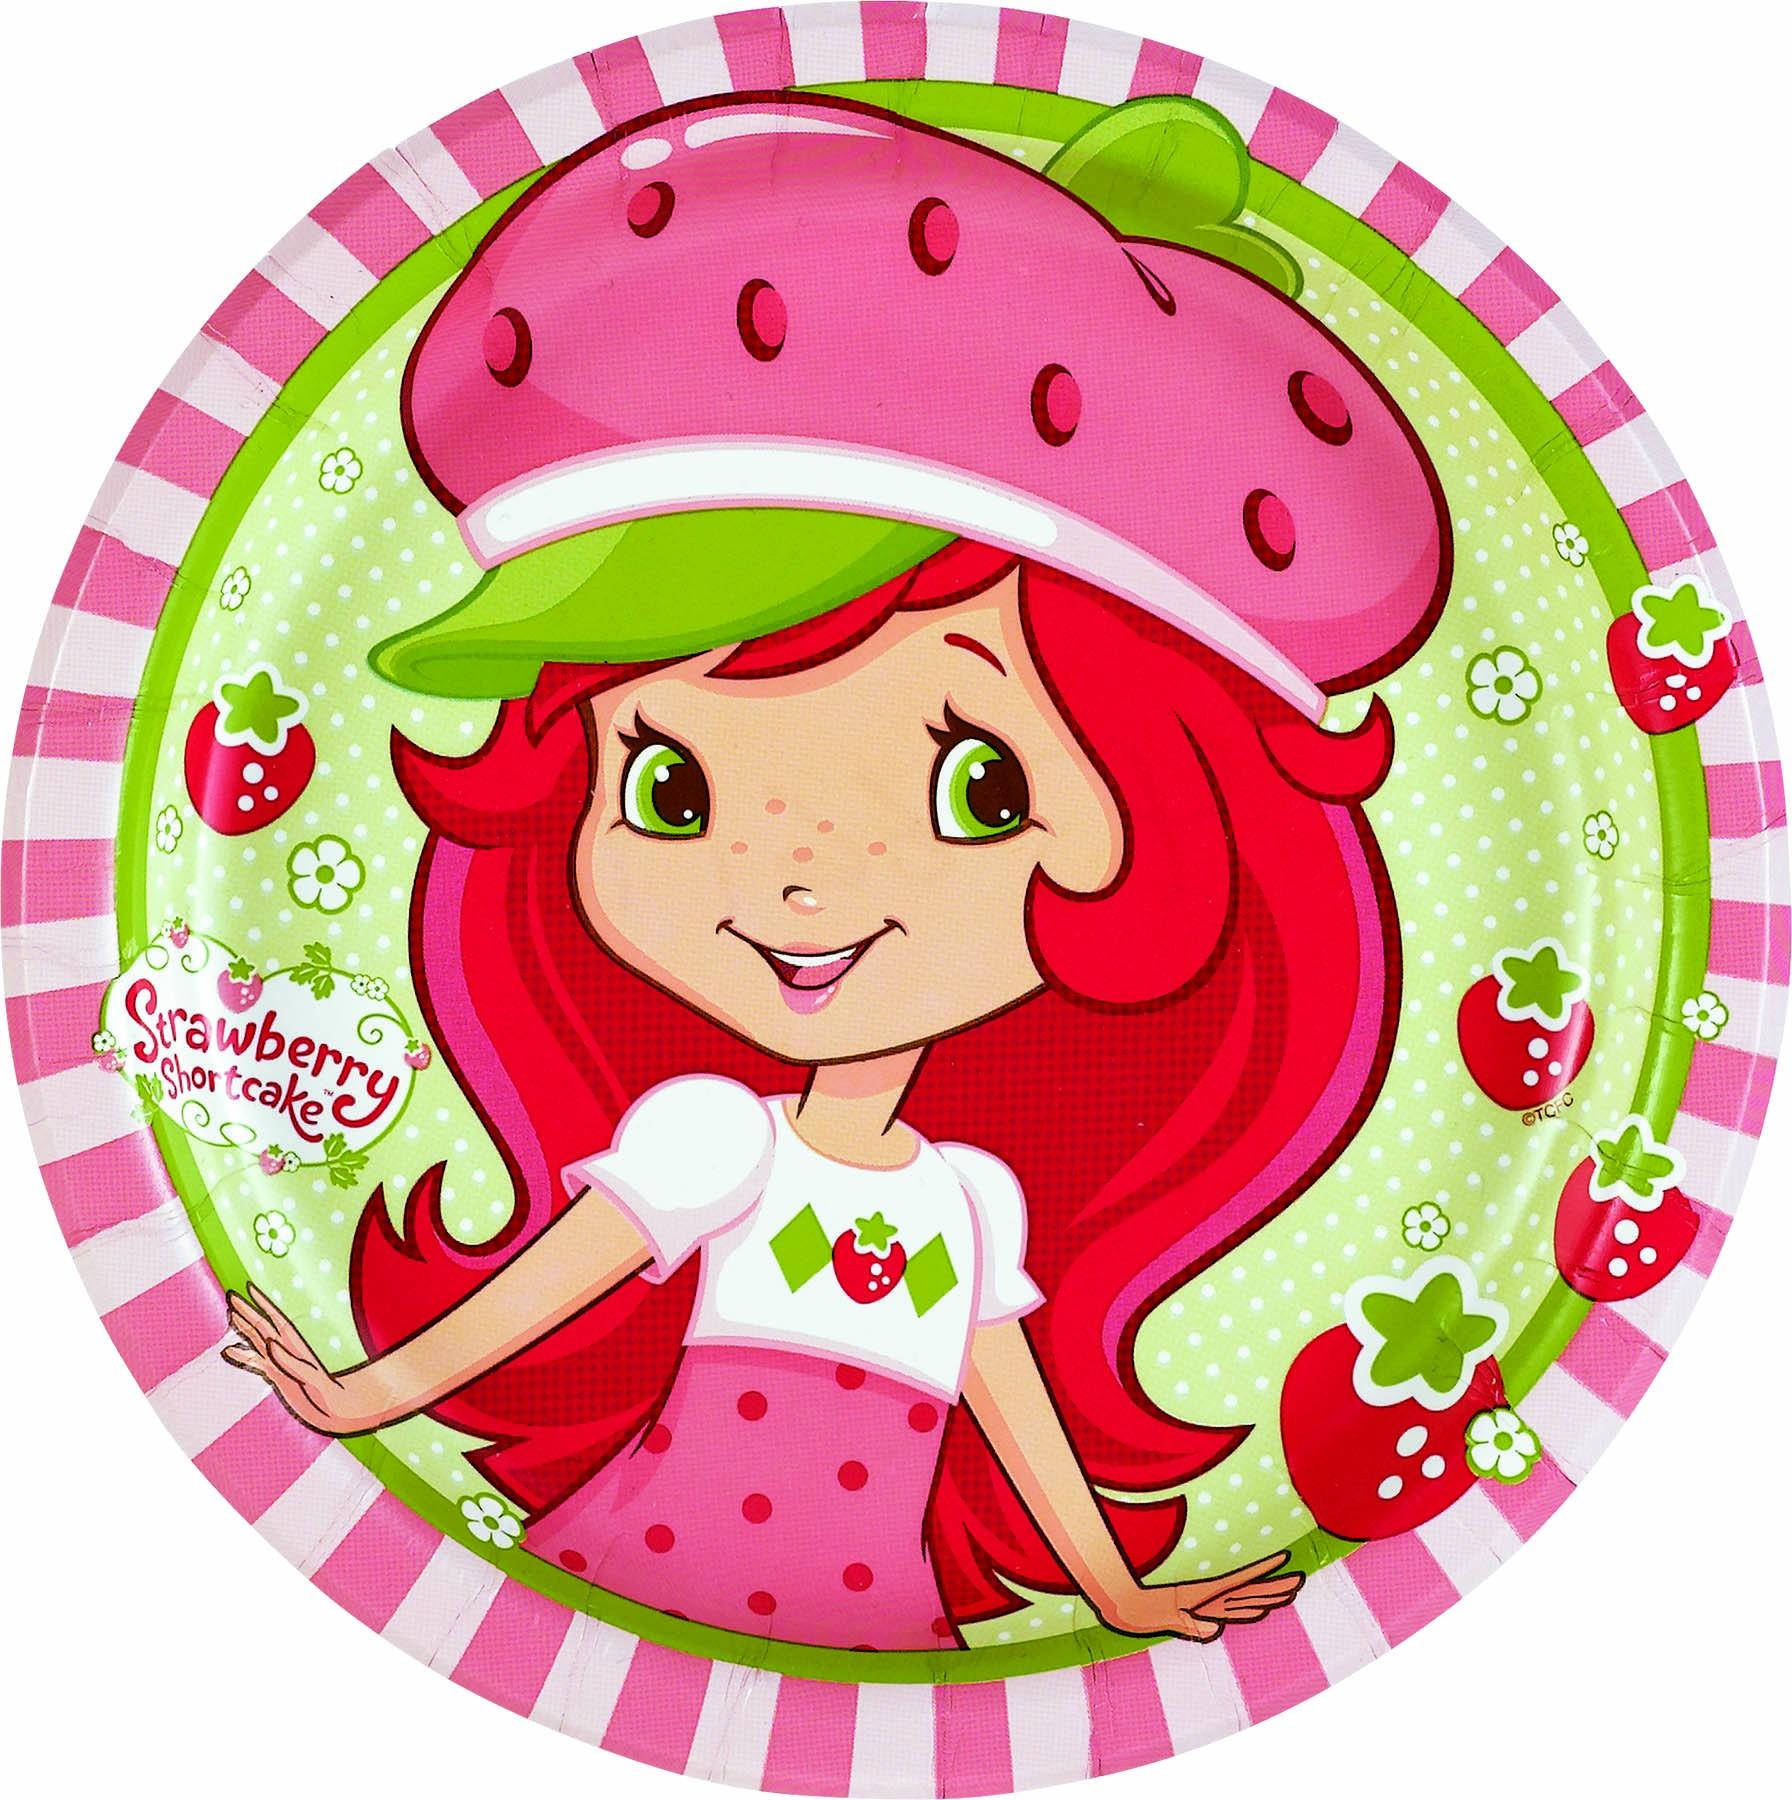 Amazing Strawberry Shortcake Pictures & Backgrounds